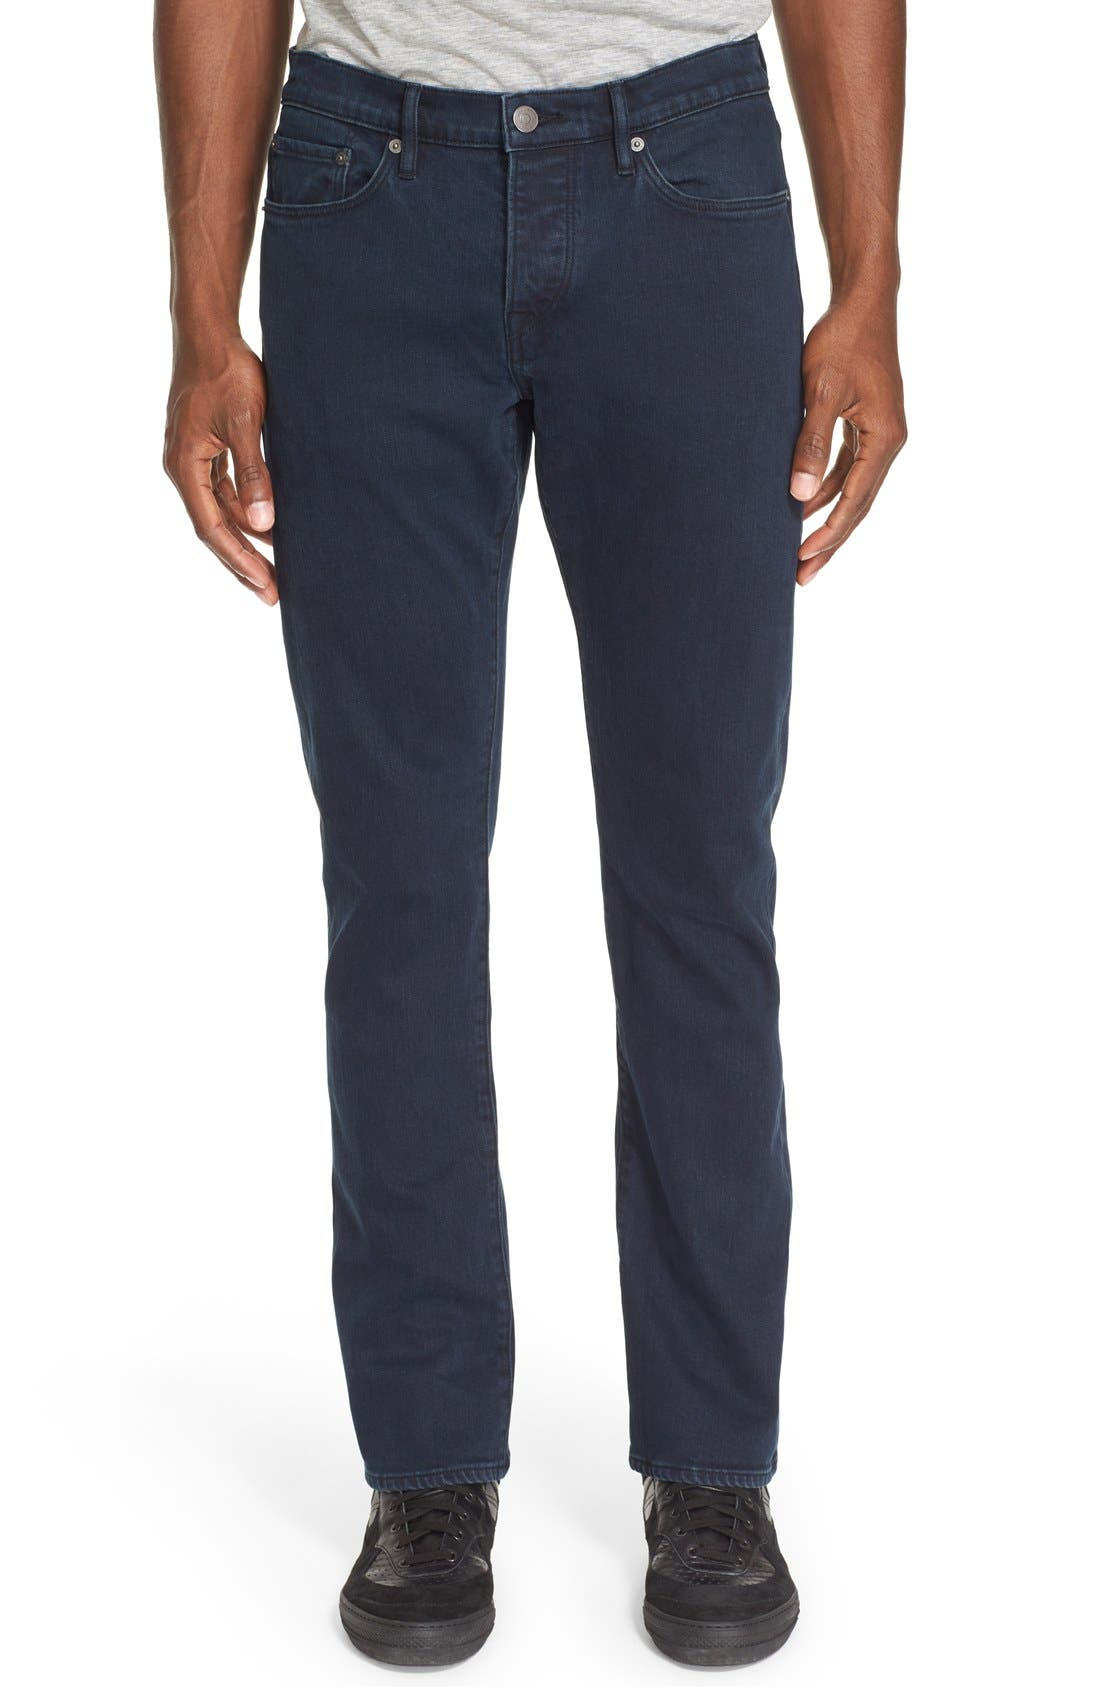 Straight Leg Jeans Jeans,                         Main,                         color, Dark Indigo